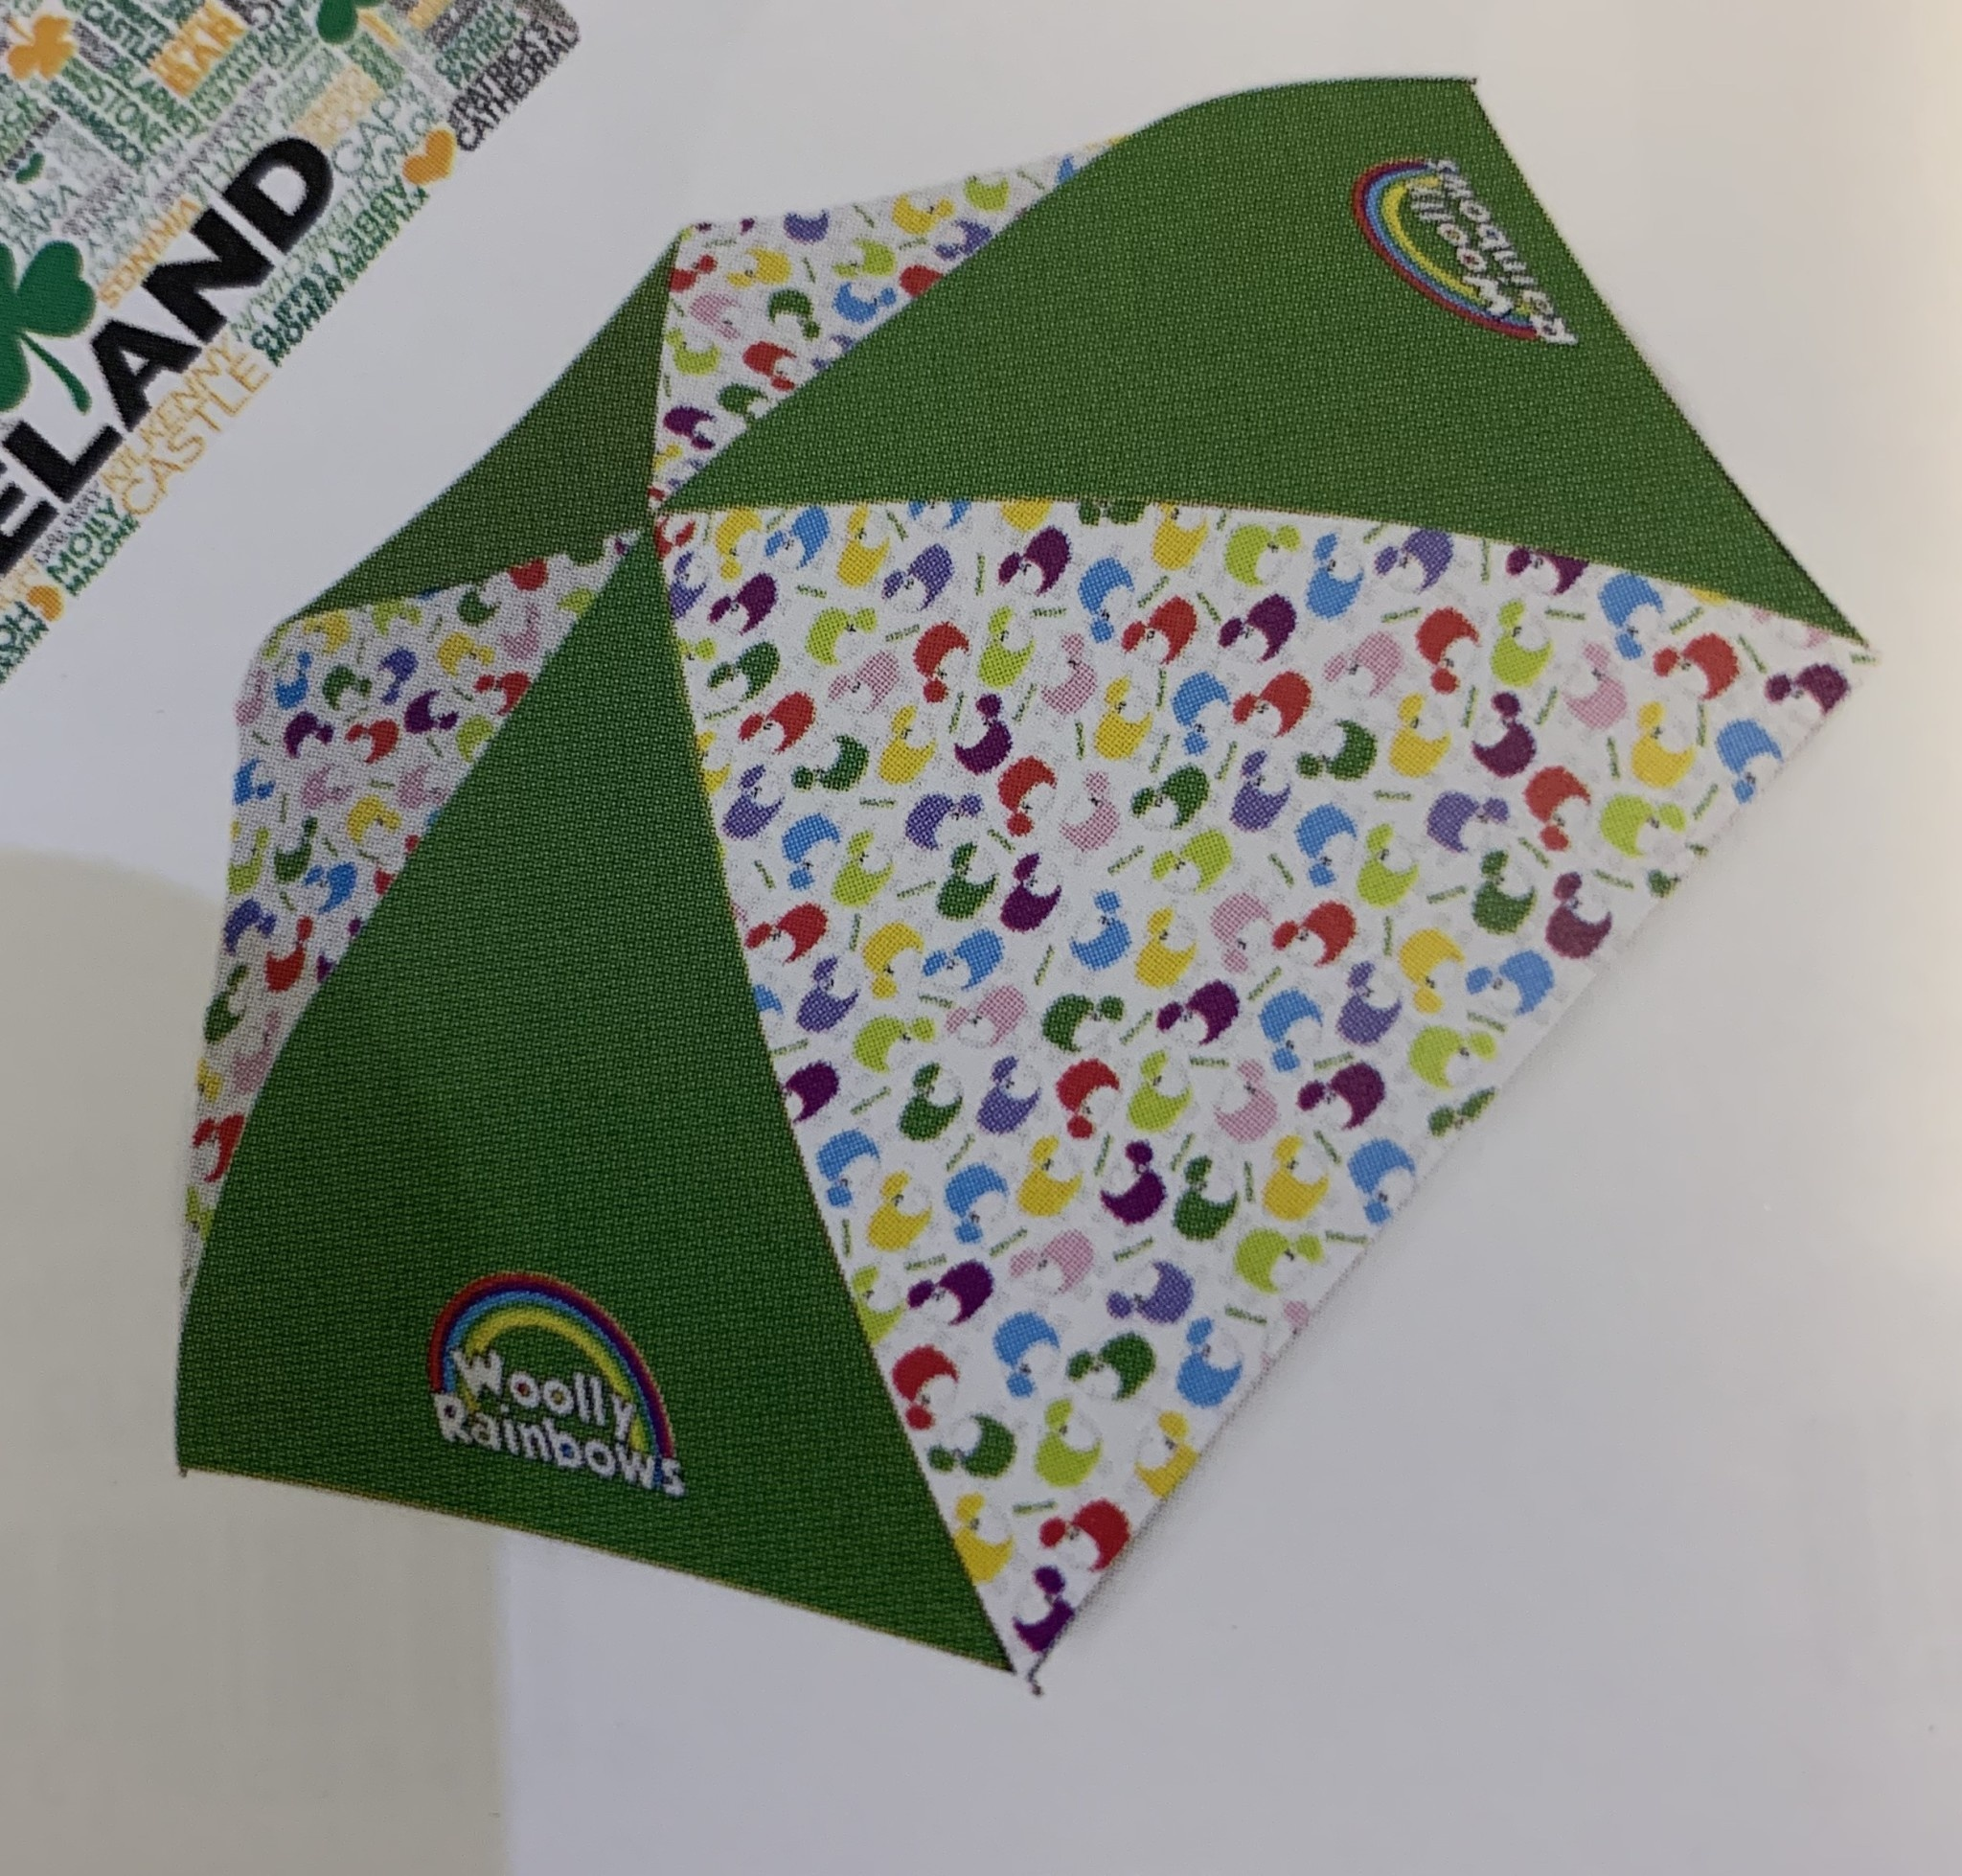 Umbrella: Woolly Rainbows